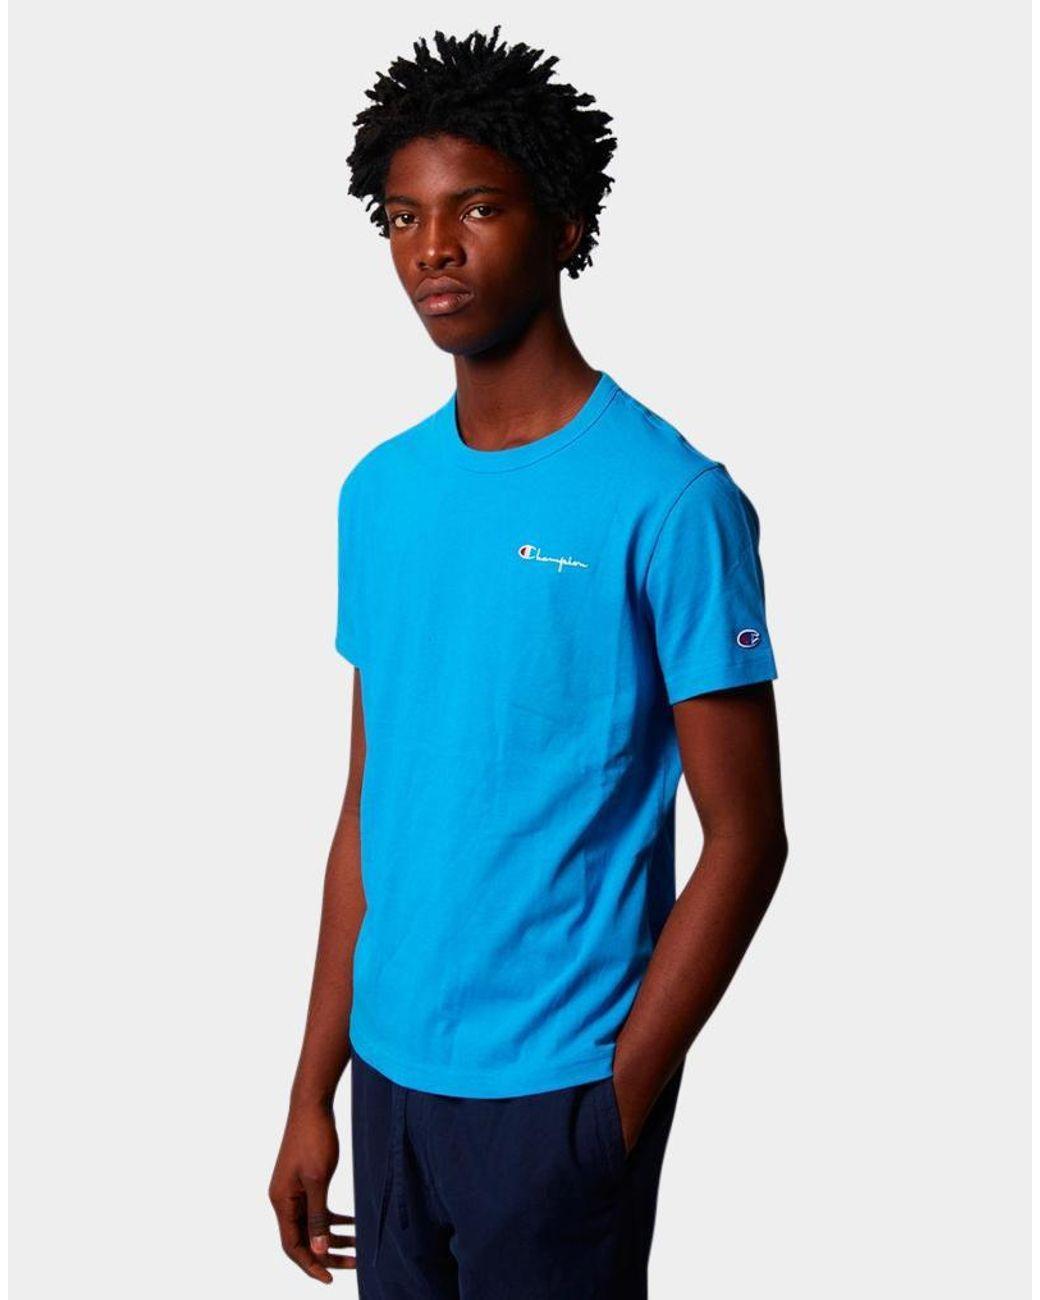 19f9548f Champion Crew Neck Tshirt Small Logo Blue in Blue for Men - Lyst